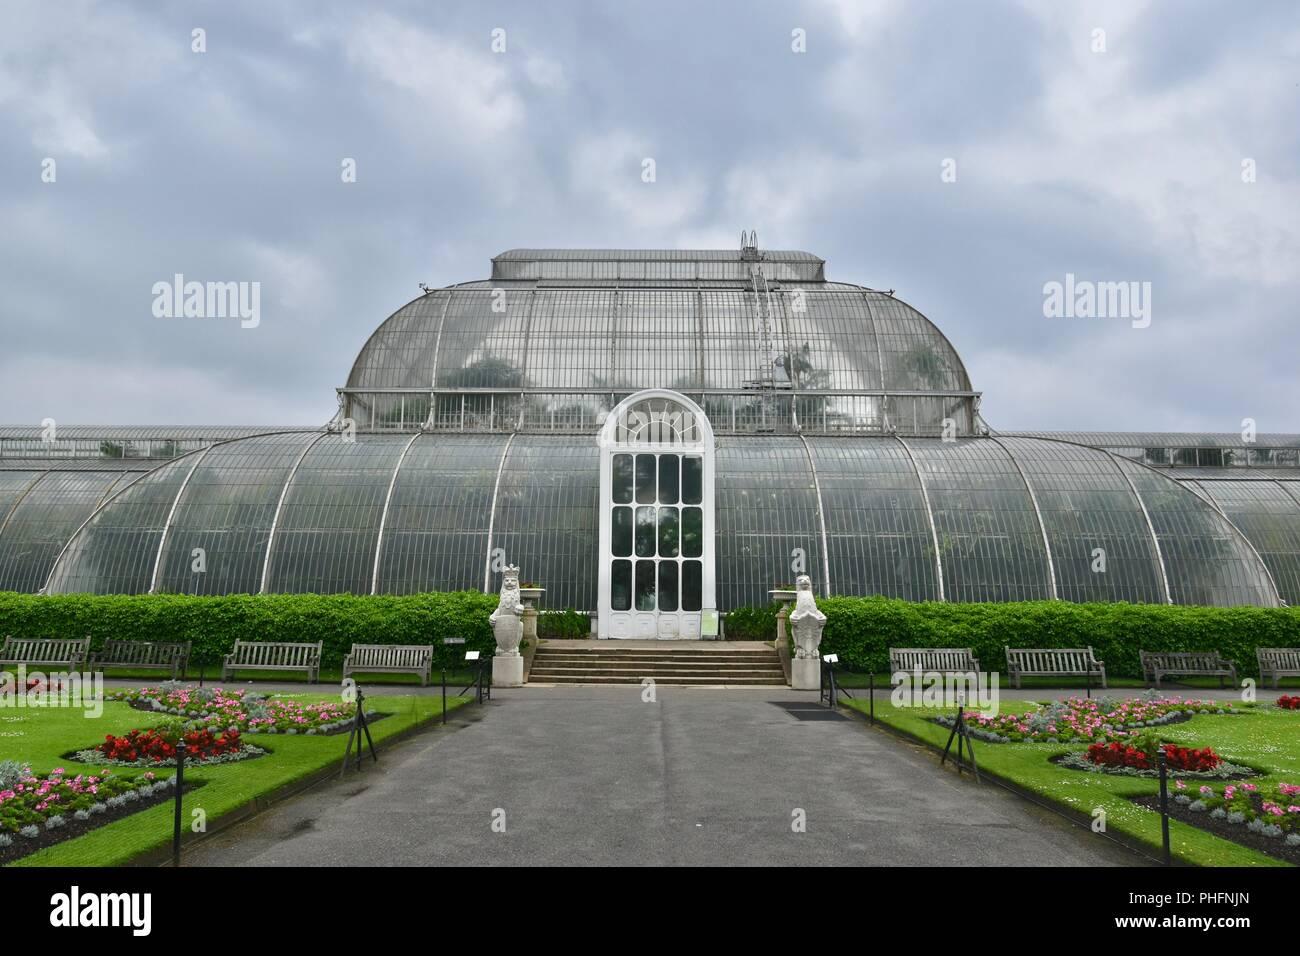 A view of Kew Royal Botanical Gardens, London, United Kingdom - Stock Image